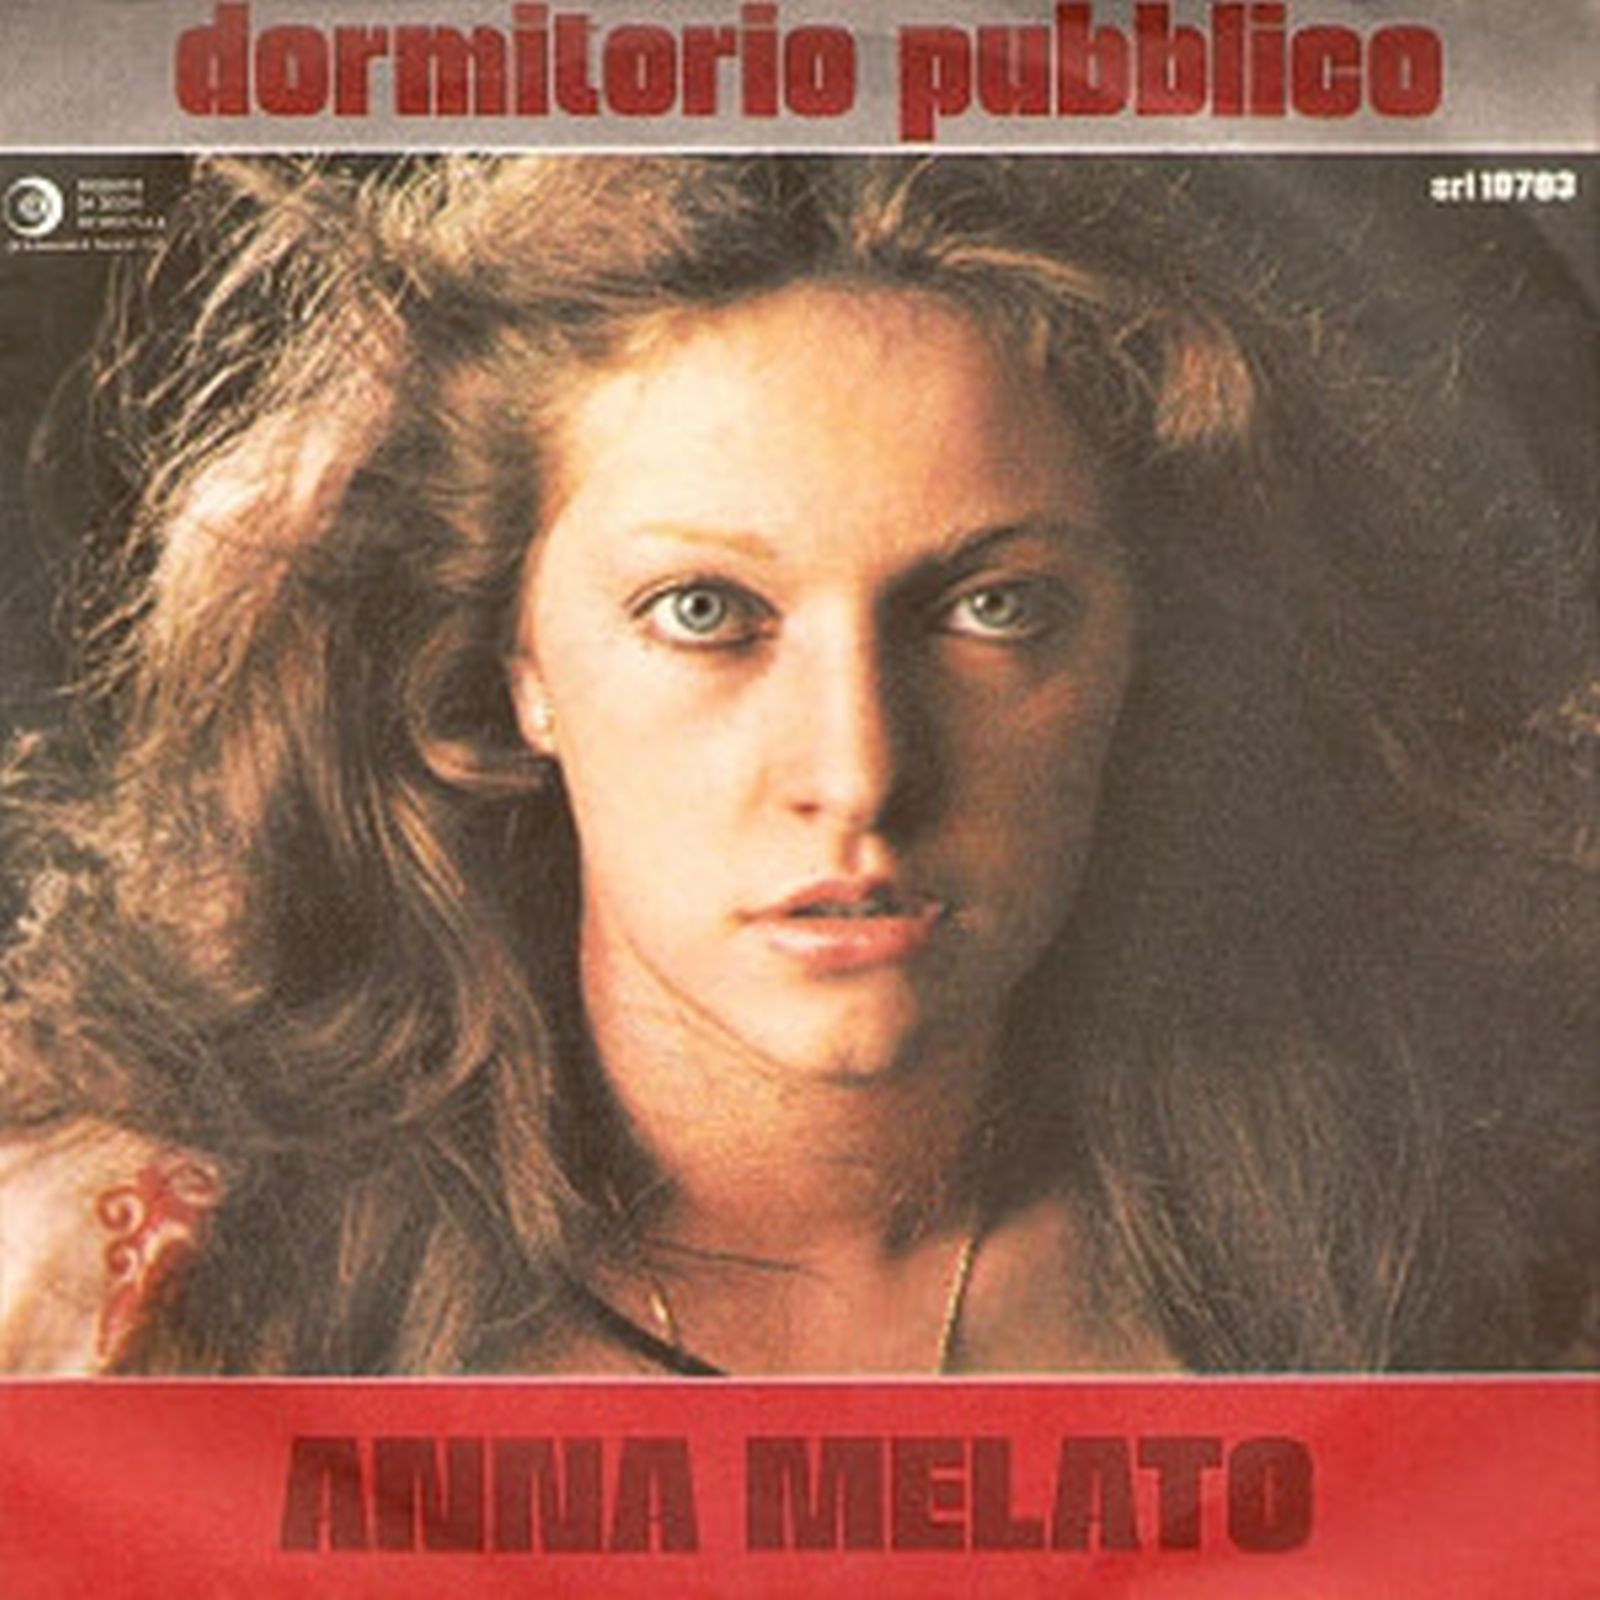 Anna Melato Anna Melato new pictures